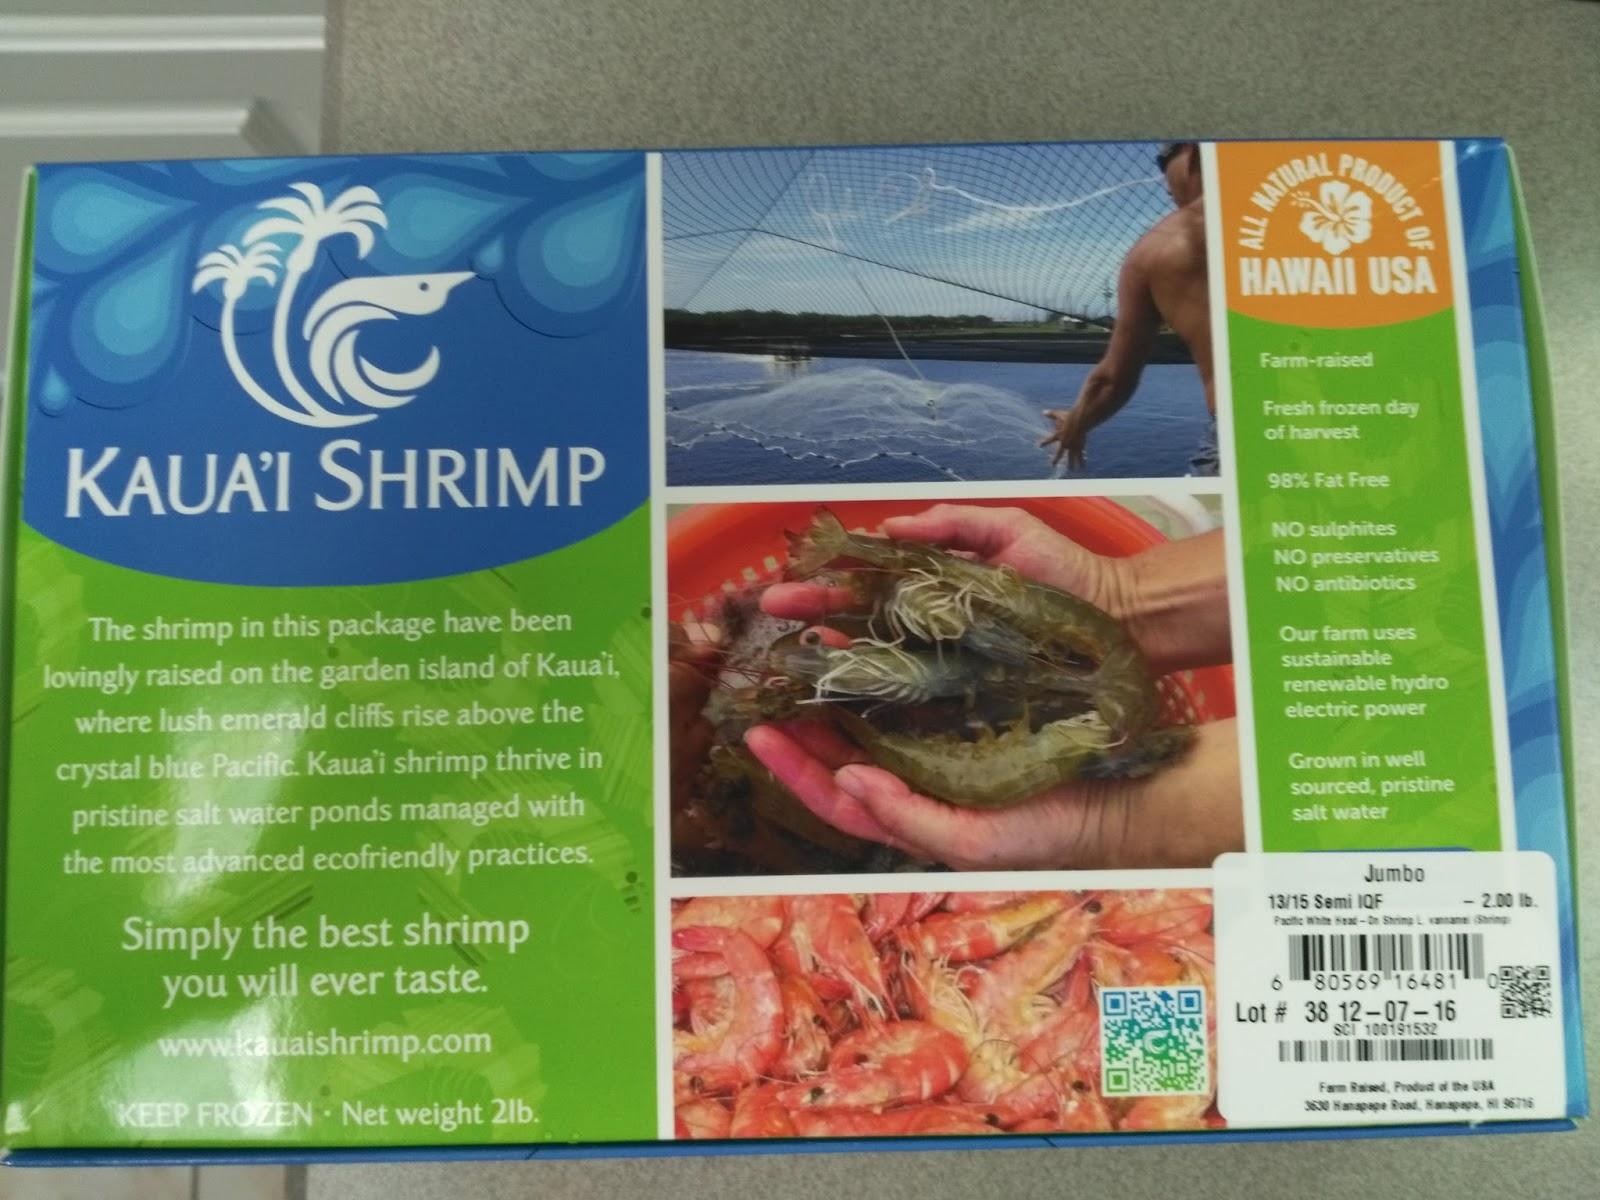 costco kitchen island alternatives to cabinets 來歐胡島costco必買蝦 must buy shrimp at oahu costco厨房岛